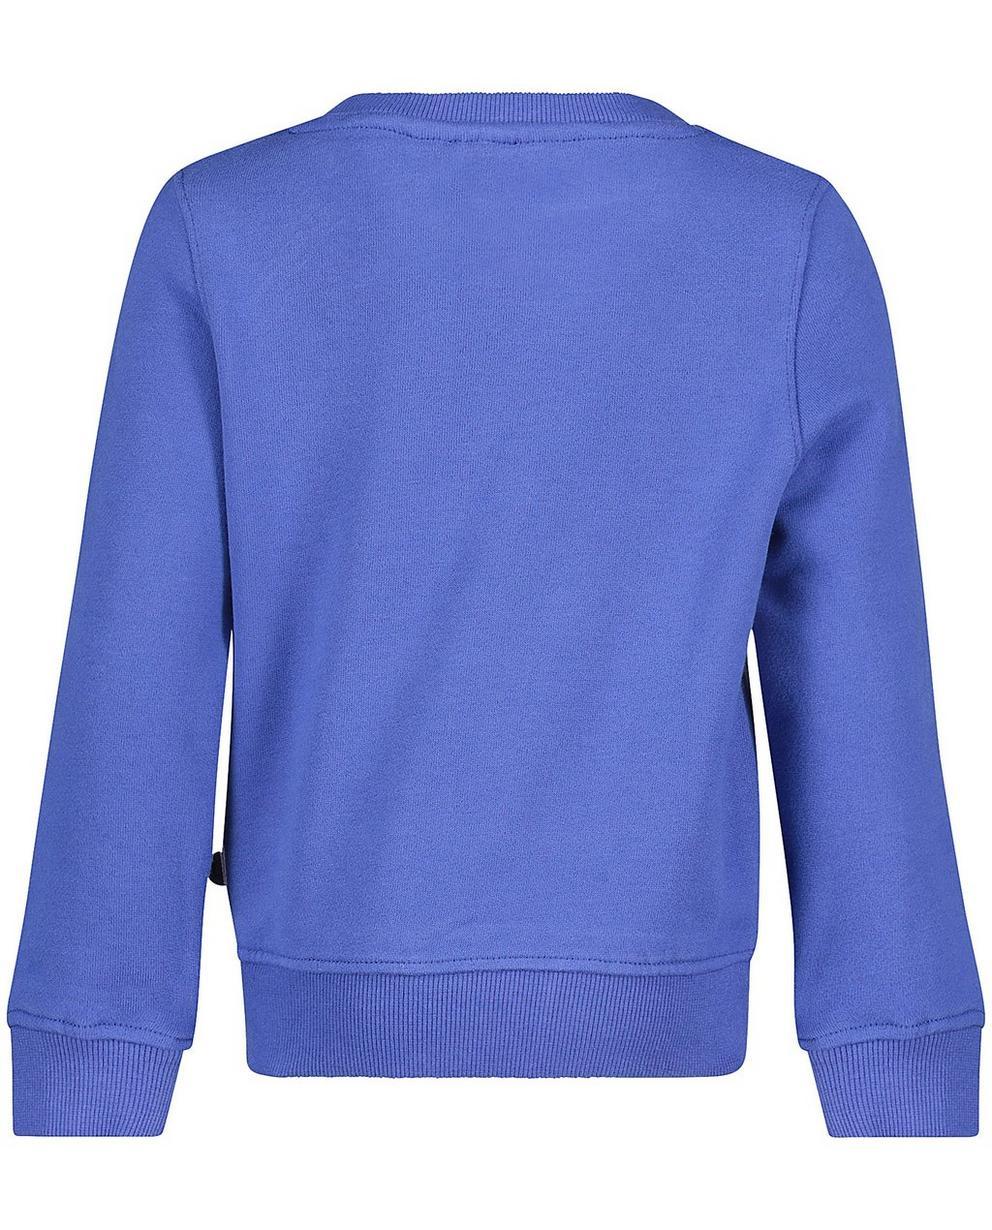 Sweaters - BLD - Lavendelblauwe sweater